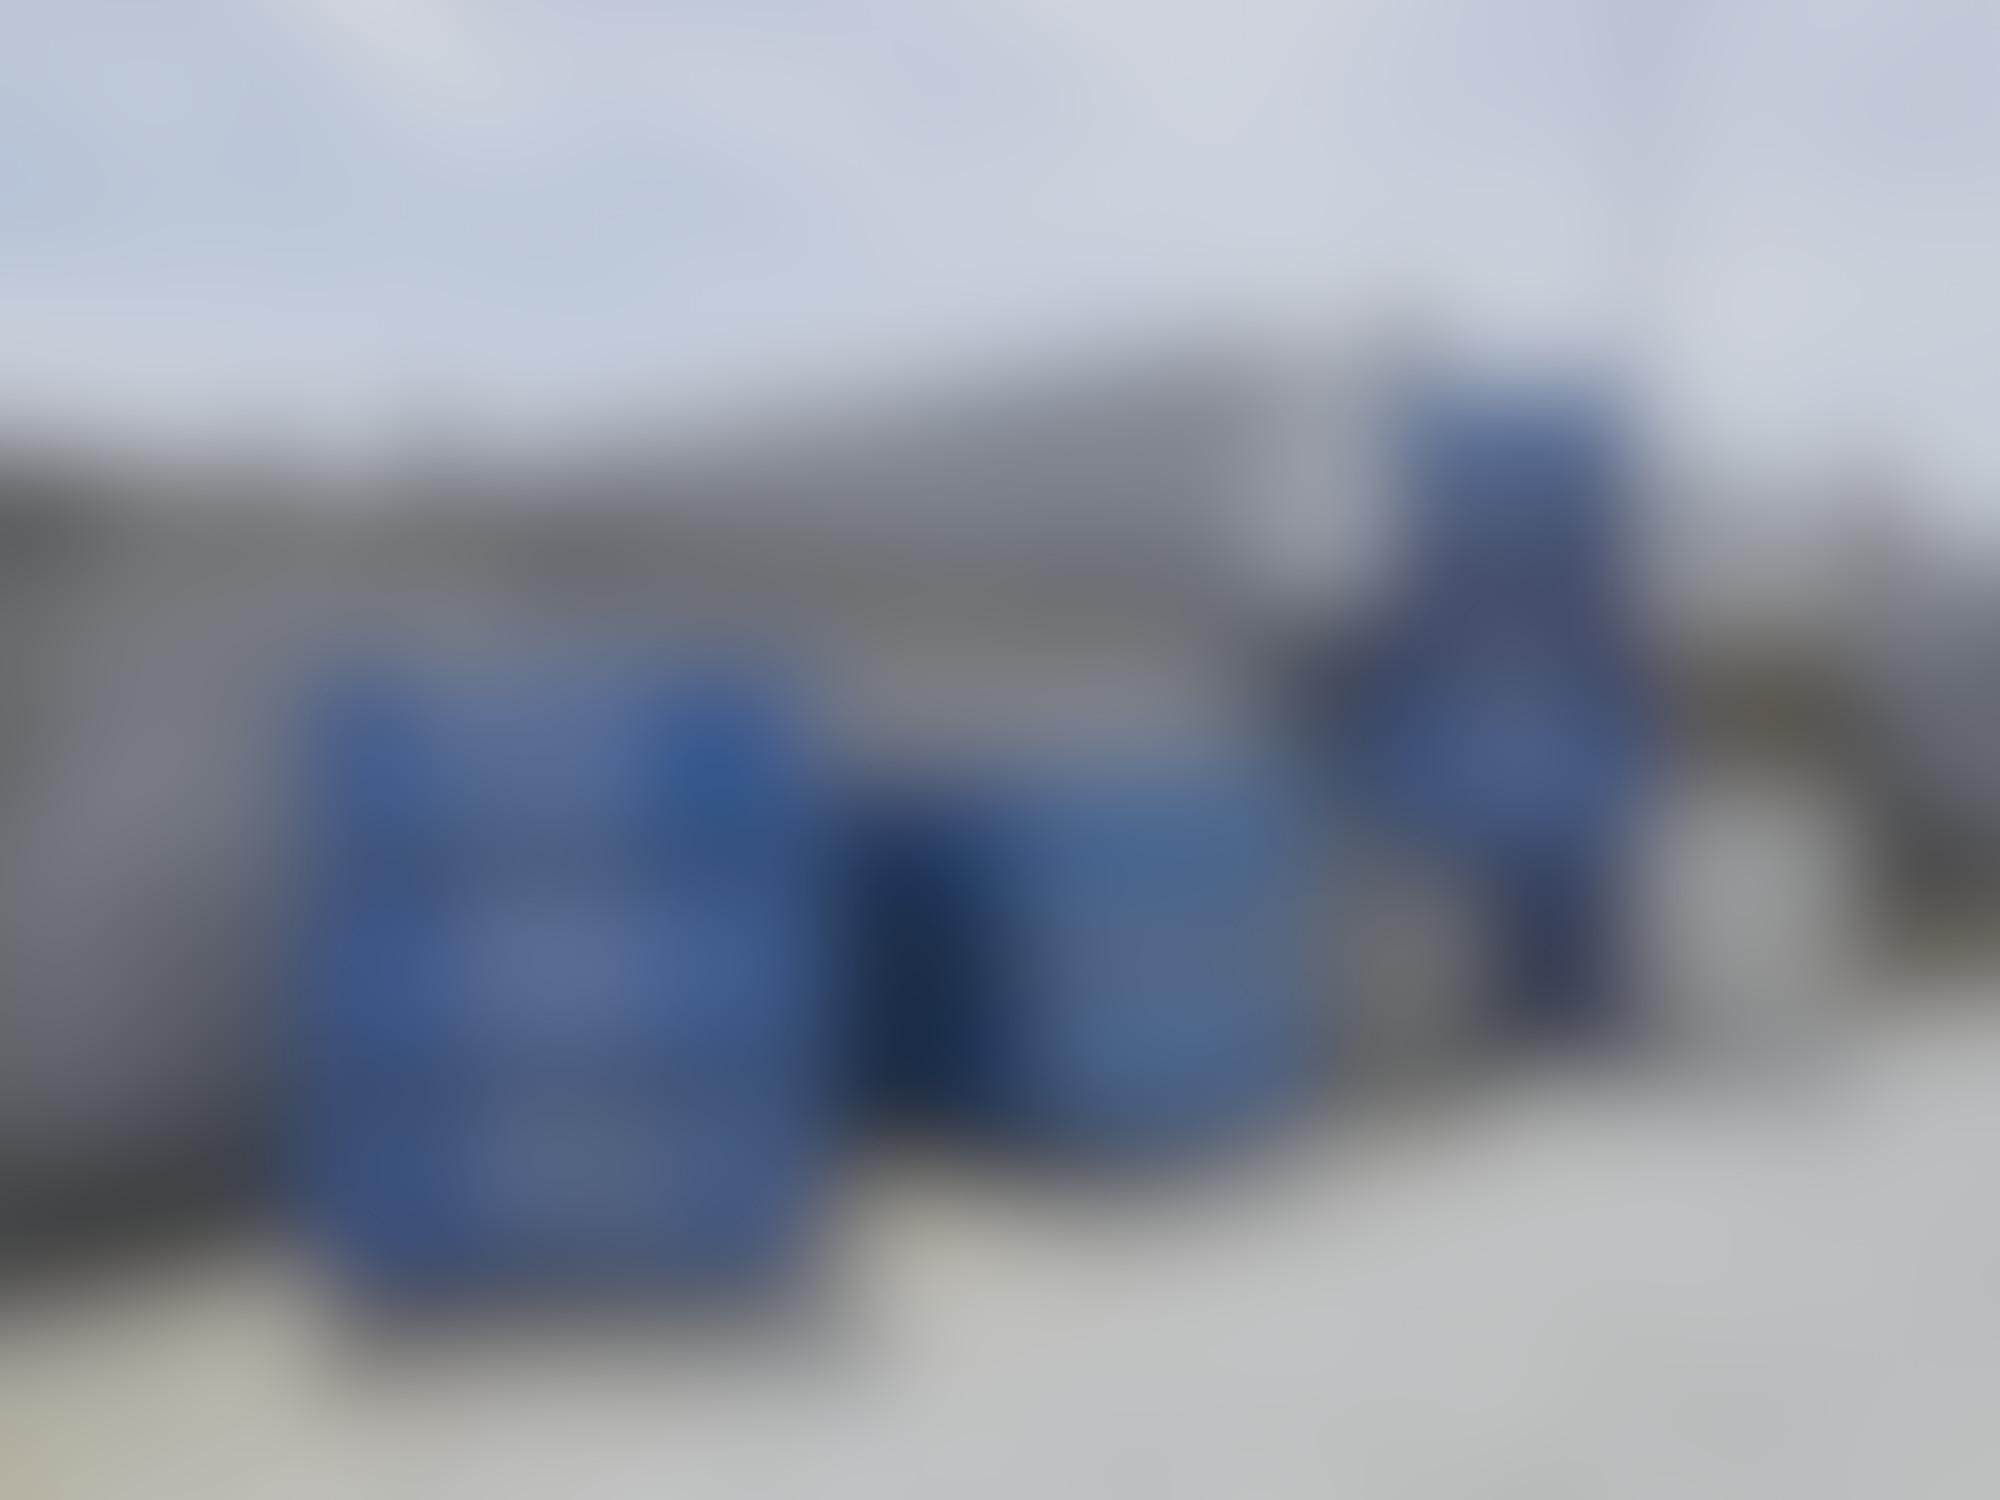 Nick Ballon Maharam Tannery09 autocompressfitresizeixlibphp 1 1 0max h2000max w3 D2000q80scc49a3141f8b42472bdb7ad55a169898